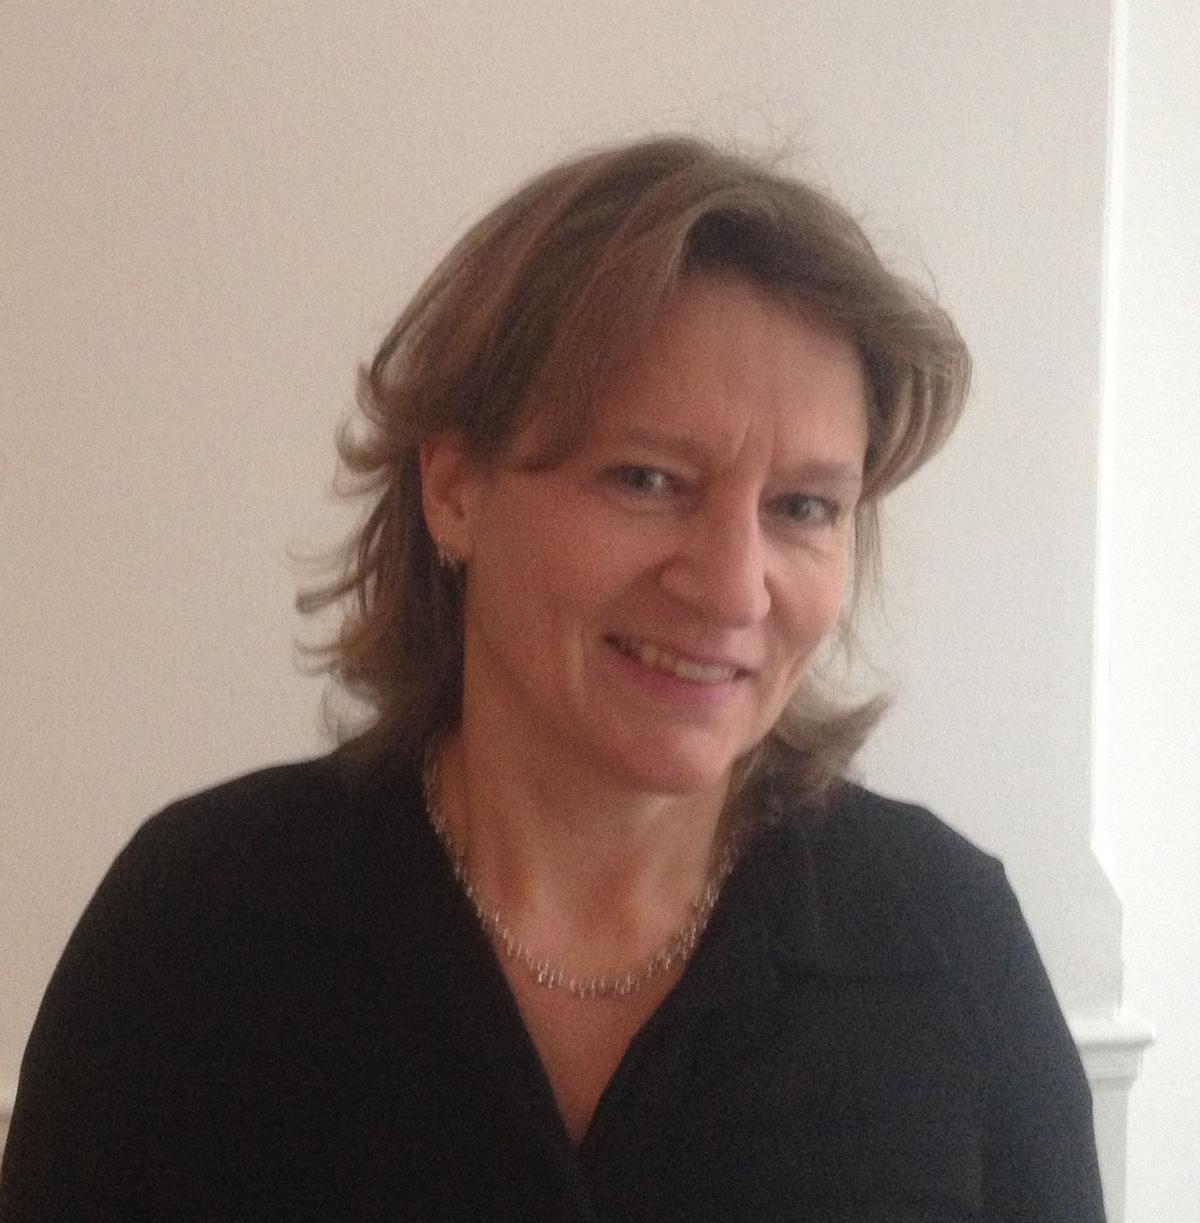 Elisabeth from Amsterdam